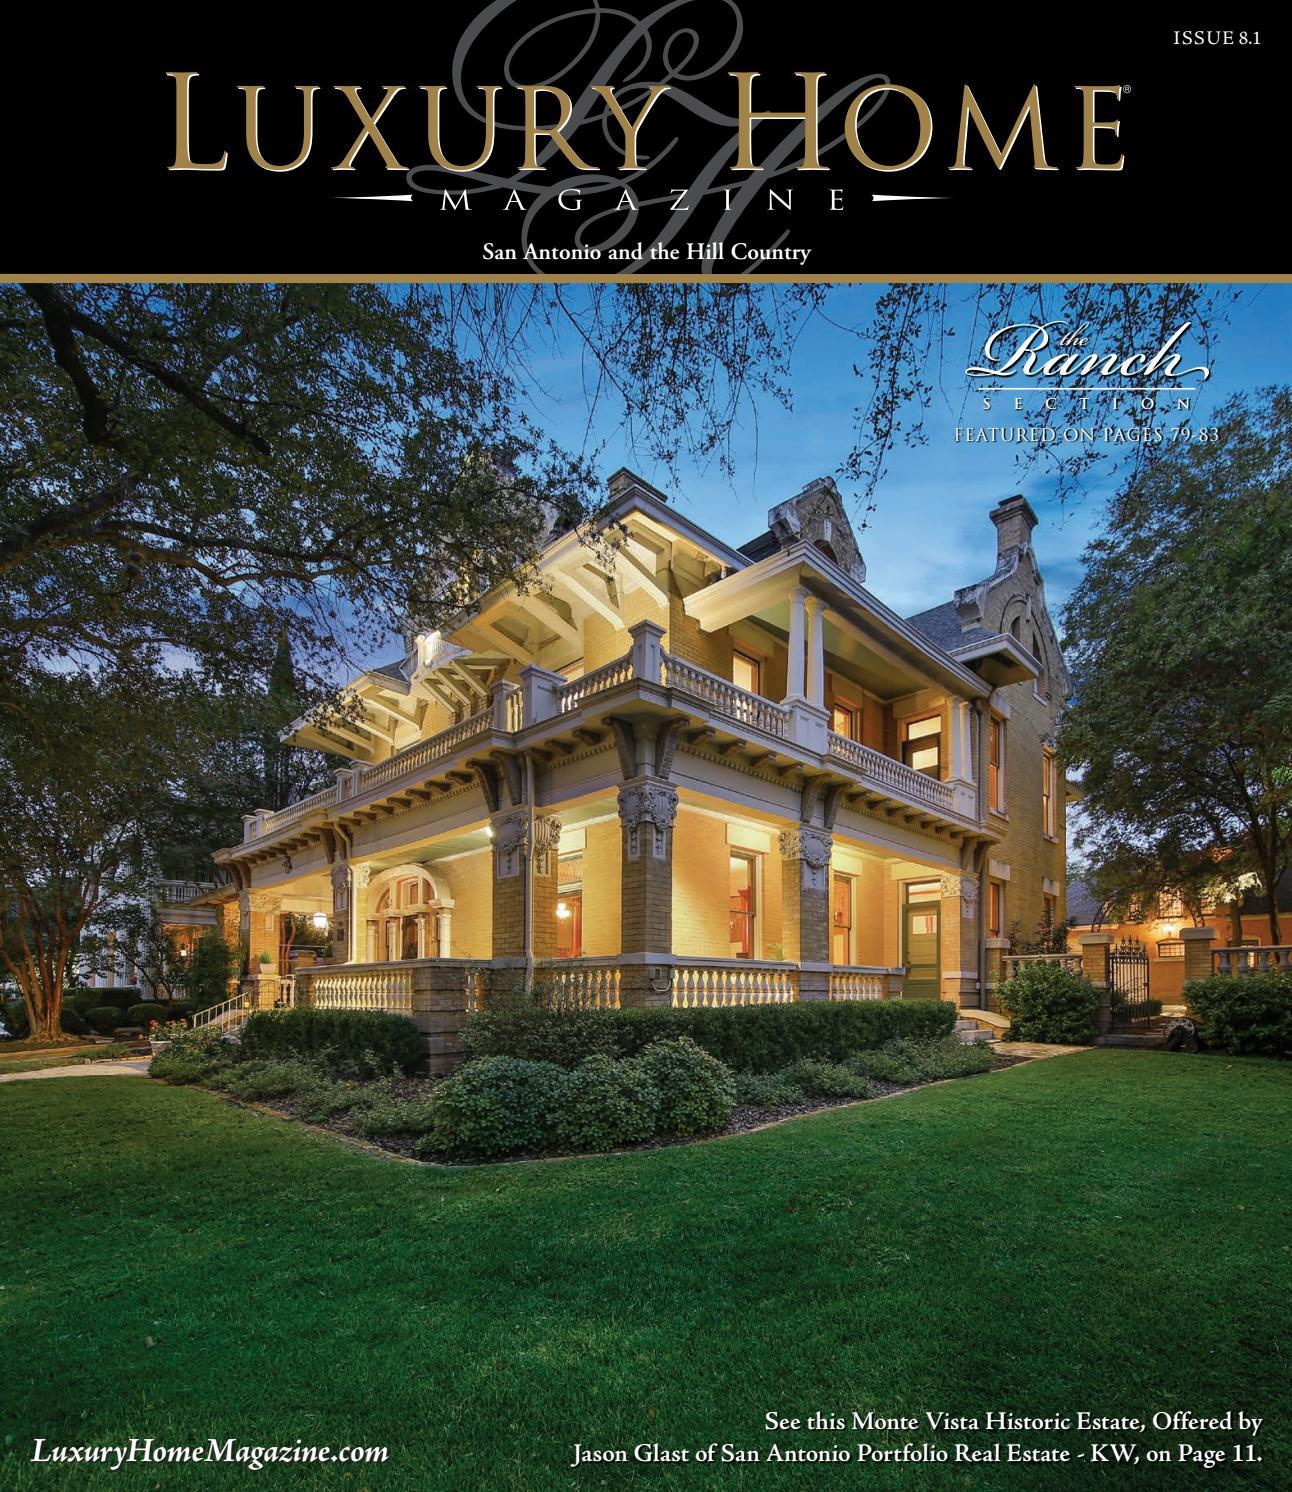 Luxury Home Magazine San Antonio Issue 8 1 by Luxury Home